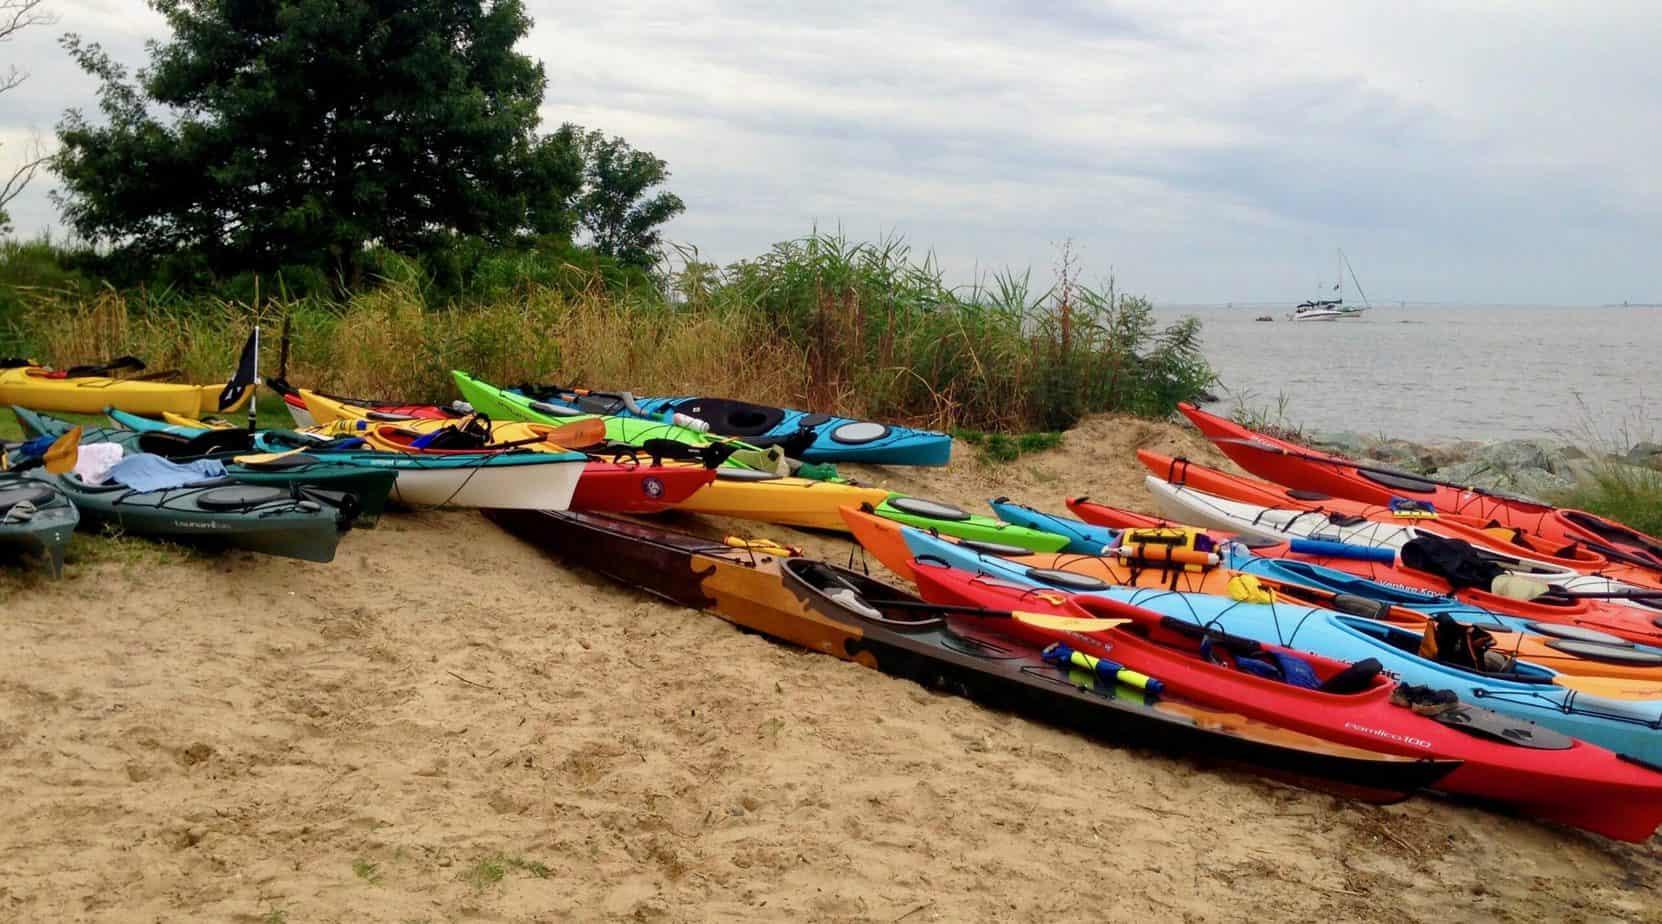 kayaks on Rock Hall public beach in Maryland